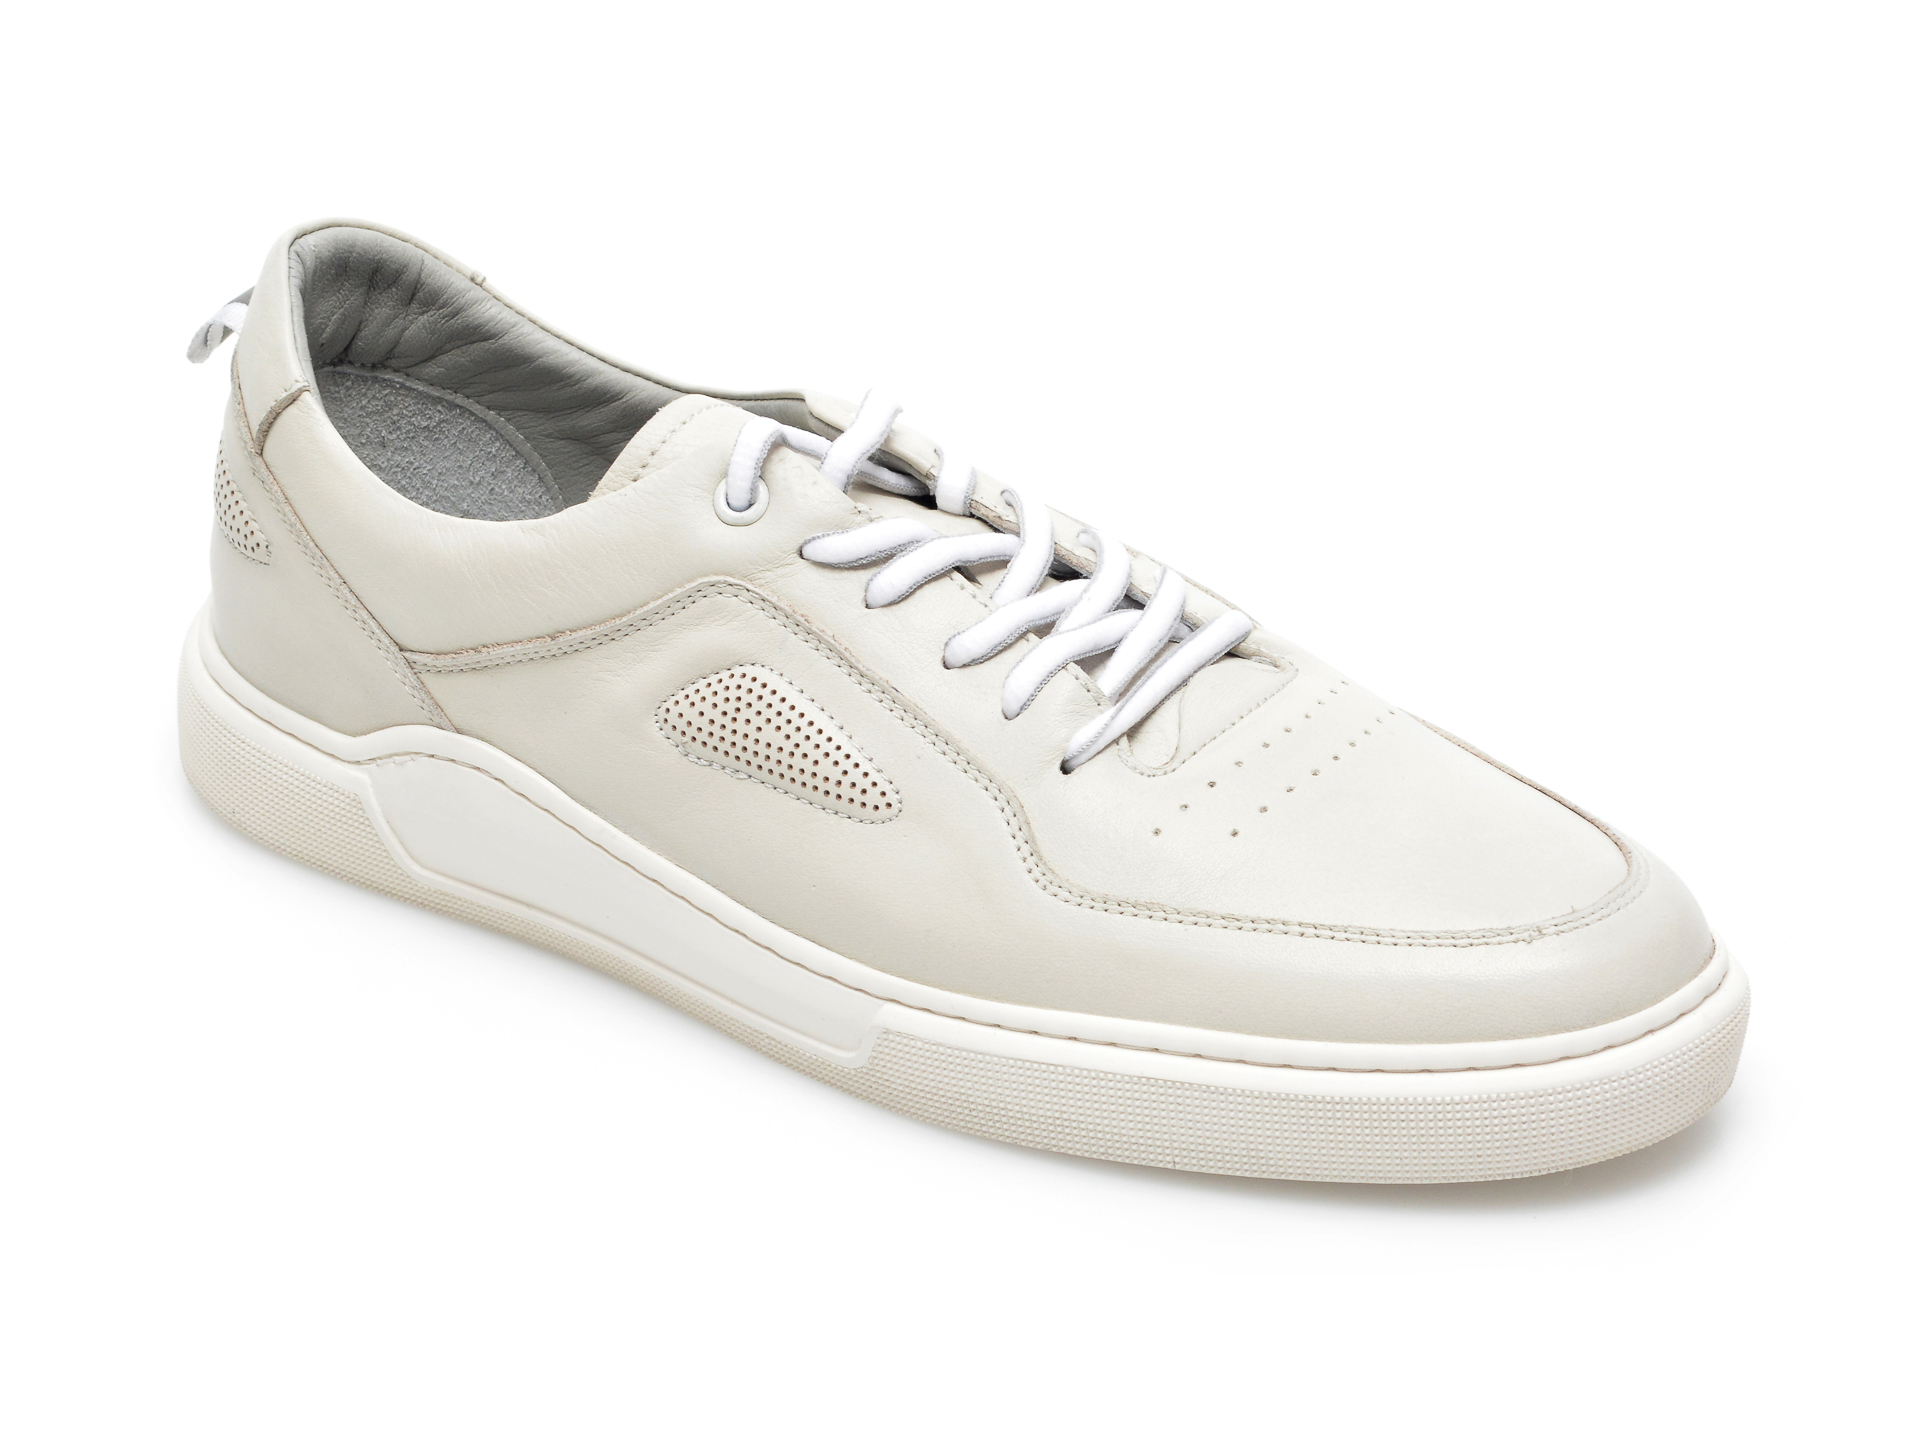 Pantofi OTTER bej, 48711, din piele naturala imagine